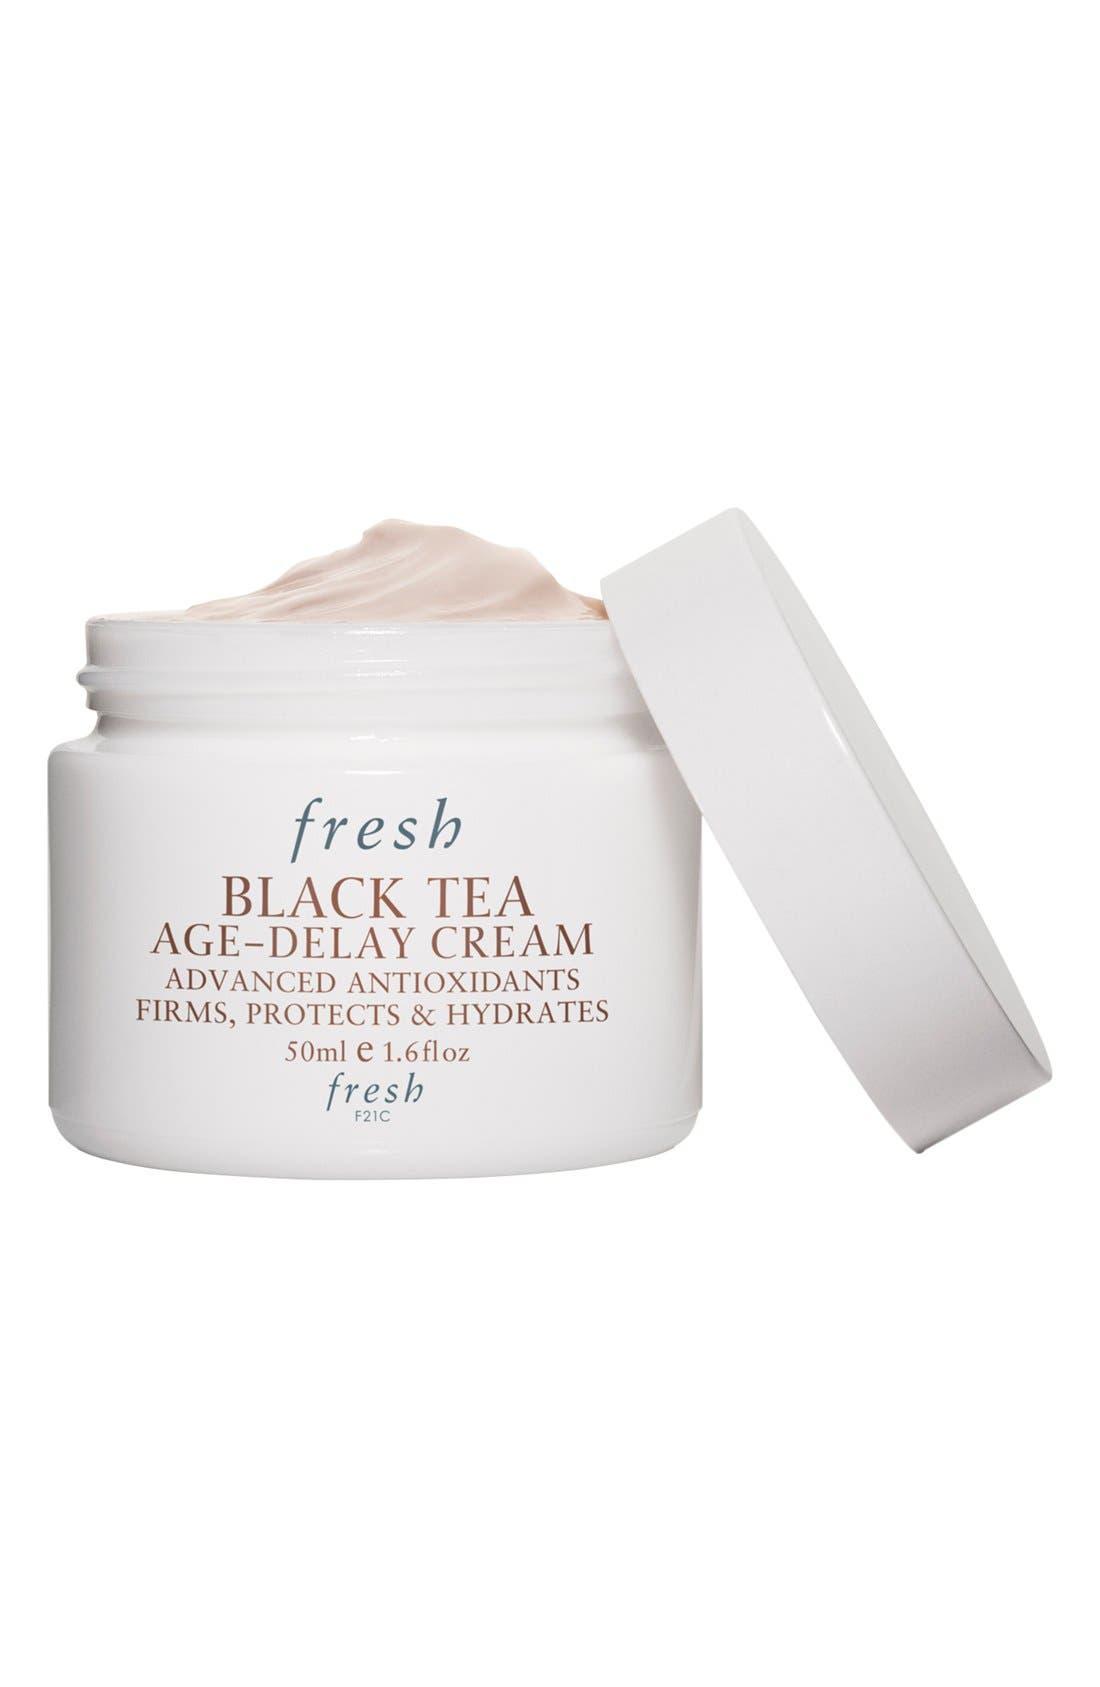 Black Tea Age-Delay Cream,                             Alternate thumbnail 4, color,                             NO COLOR